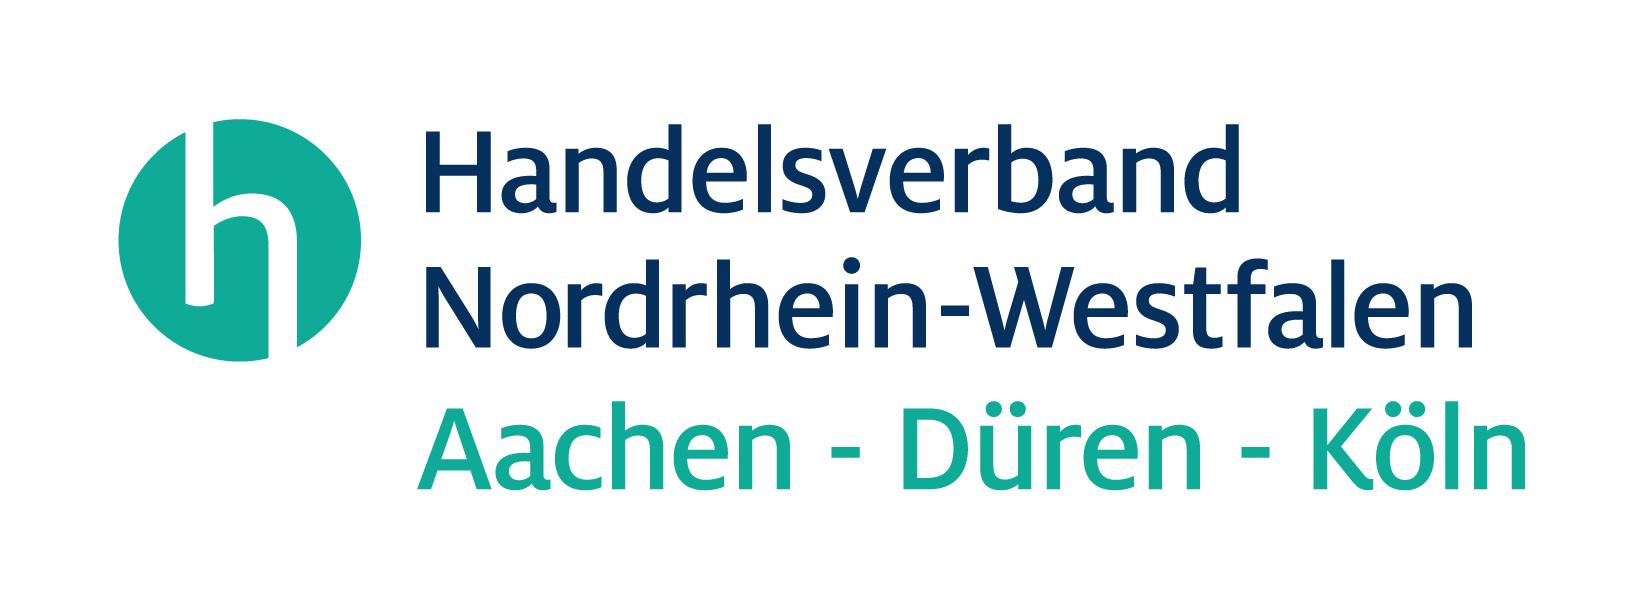 Handelsverband NRW Aachen-Düren-Köln